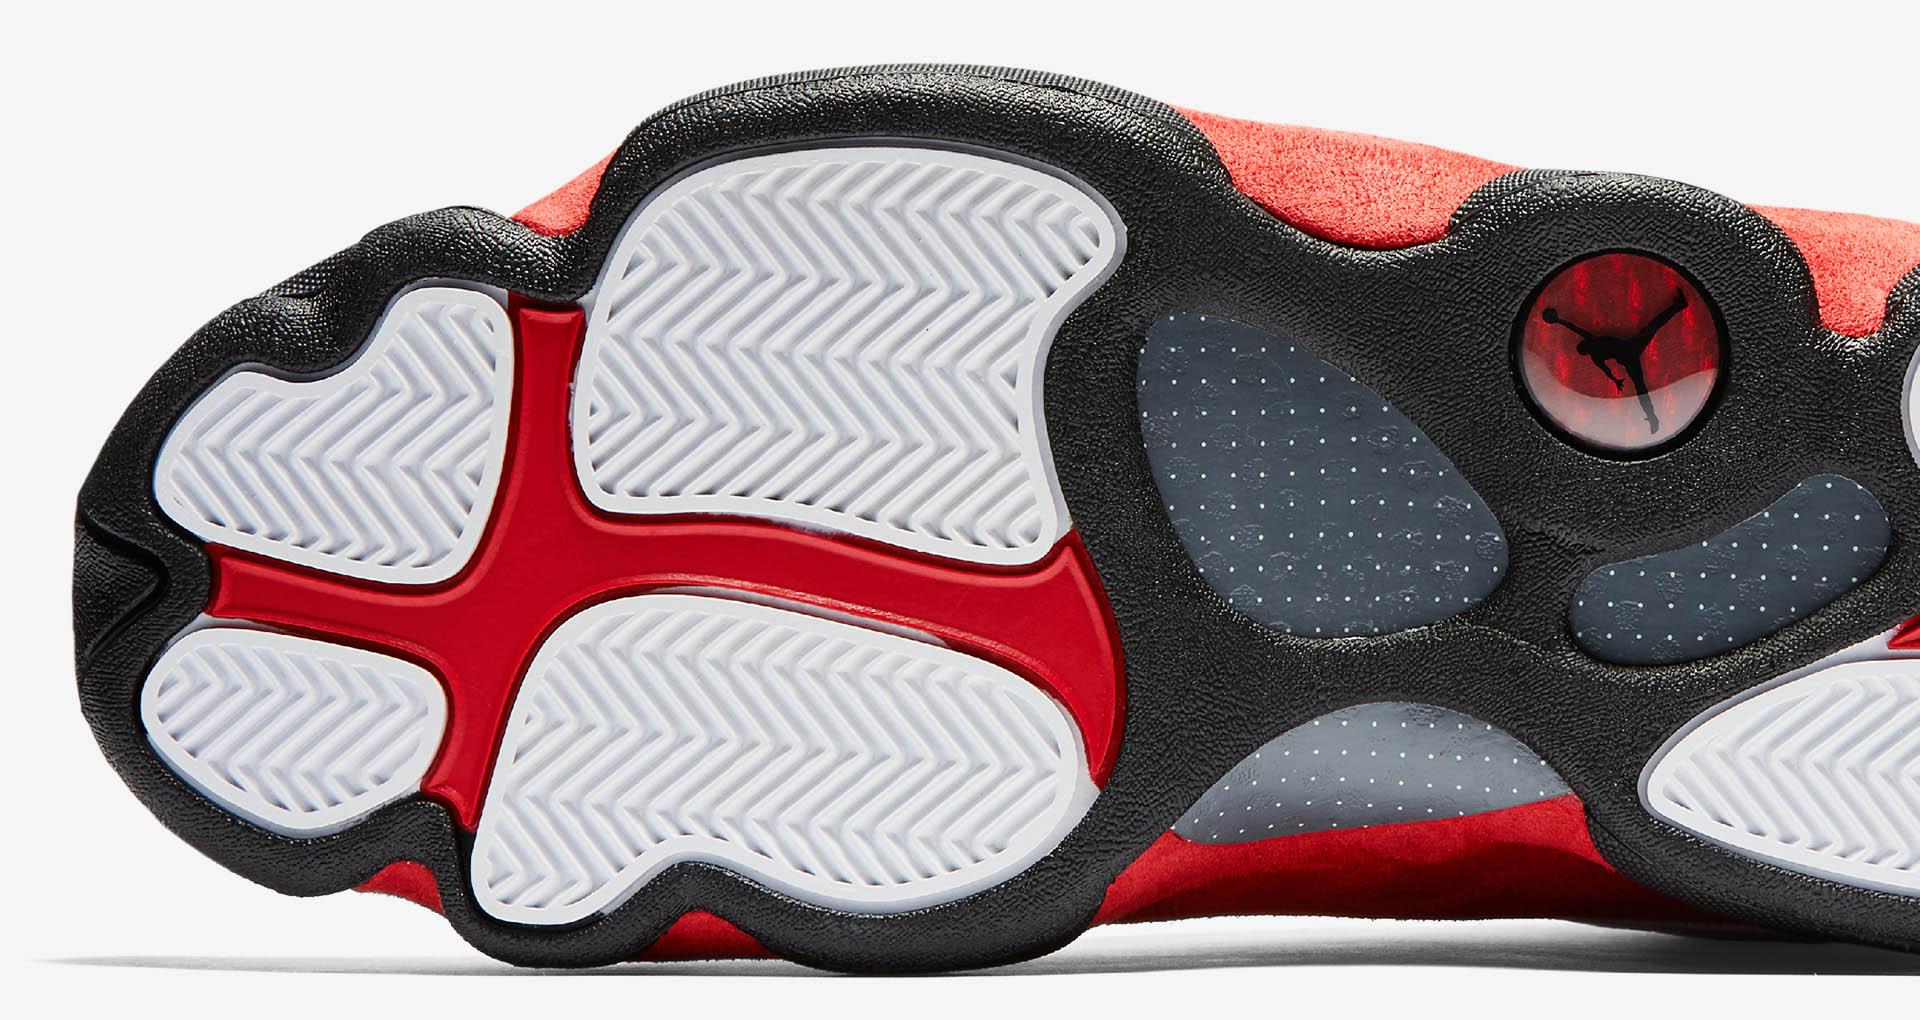 772d831734d326 He took the court in 1985 wearing the original Air Jordan I